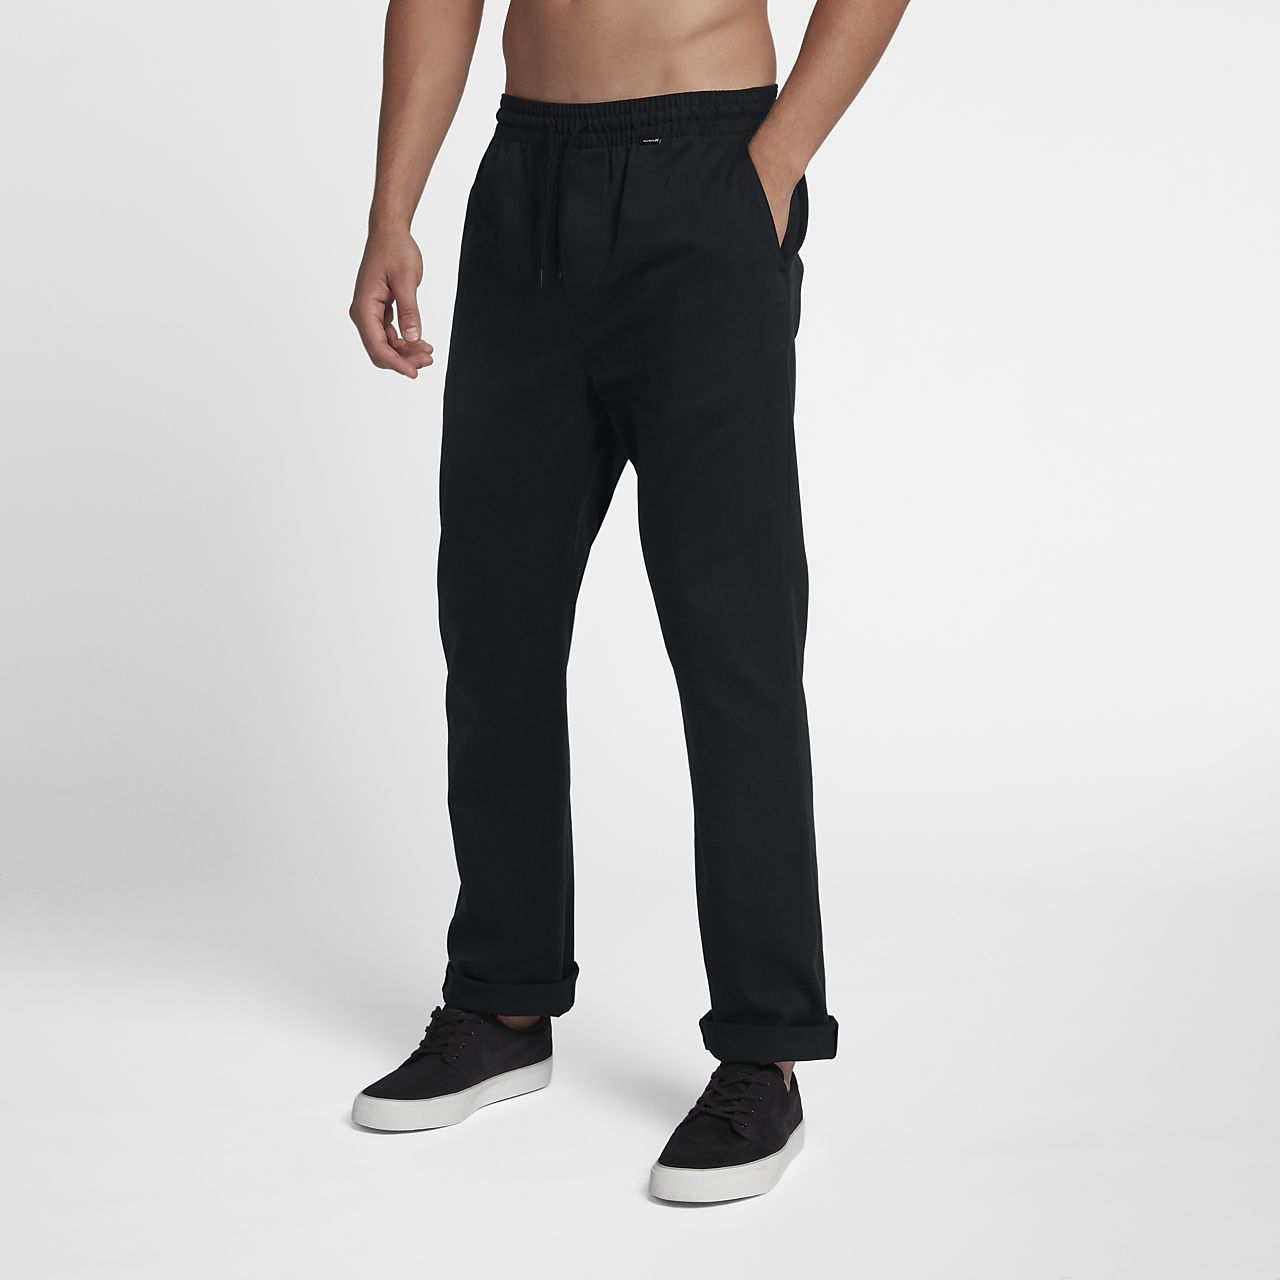 pantaloni nike uomo dri fit